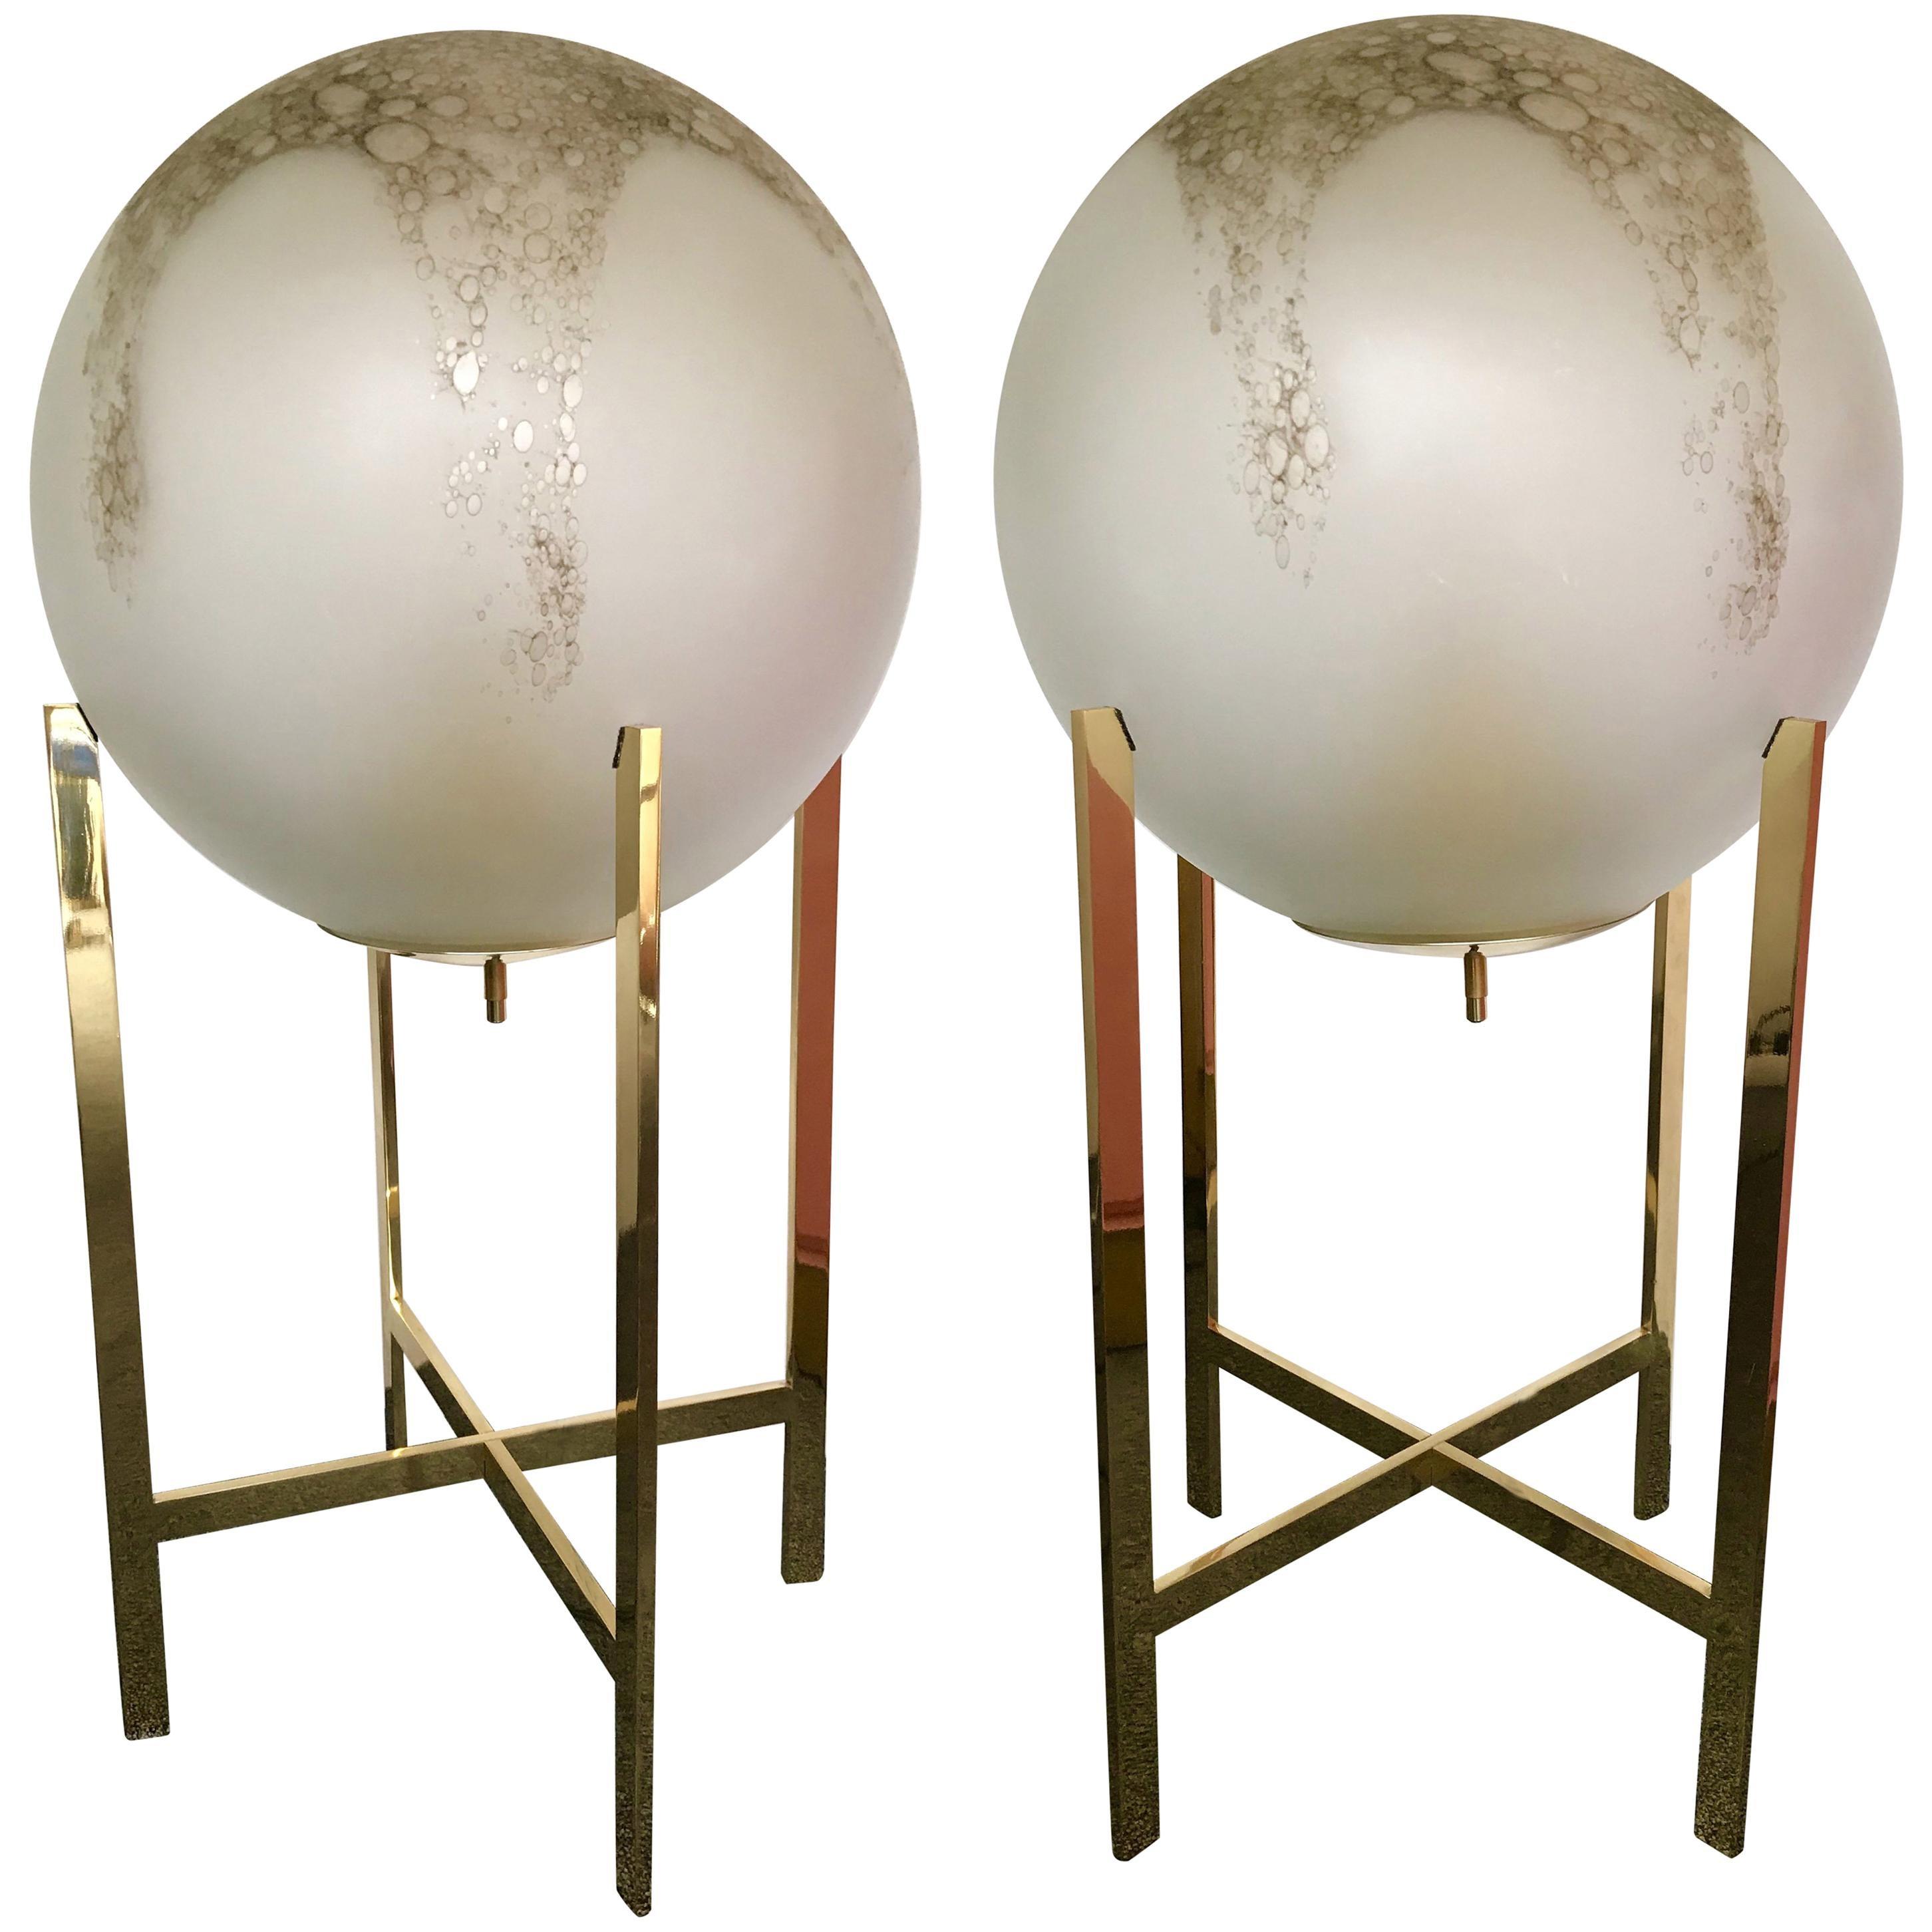 Brass Floor Lamps by La Murrina Murano Glass, Italy, 1990s